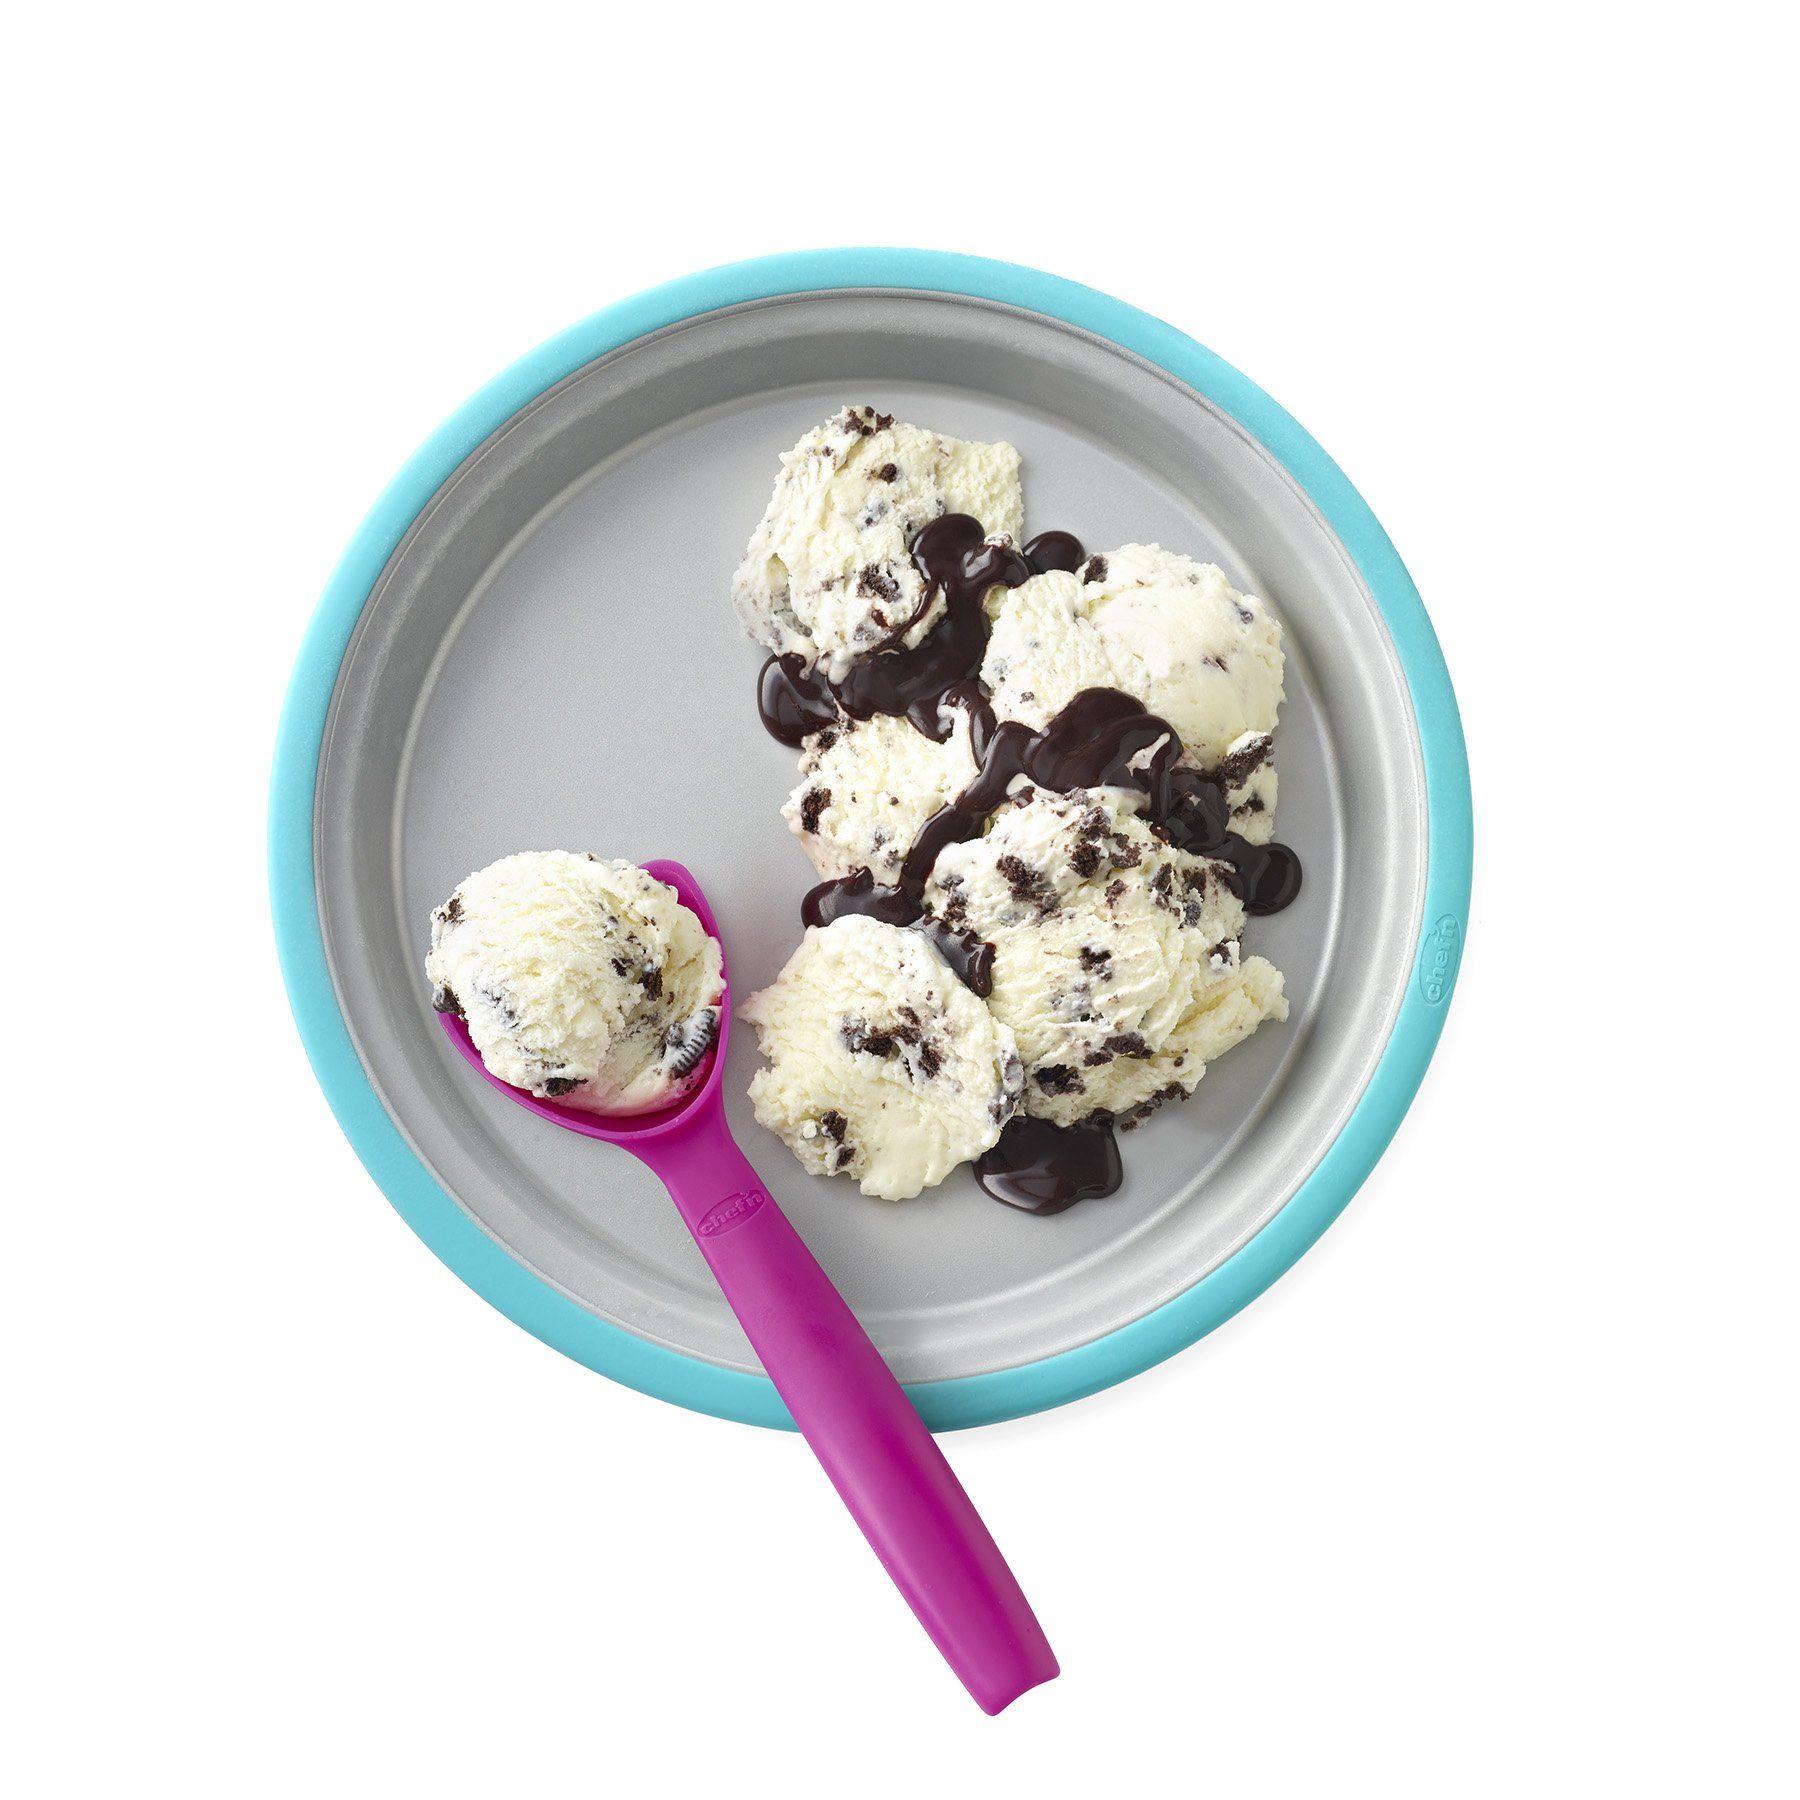 Lagoon Color Chefn Sweet Spot Instant Ice Cream Maker